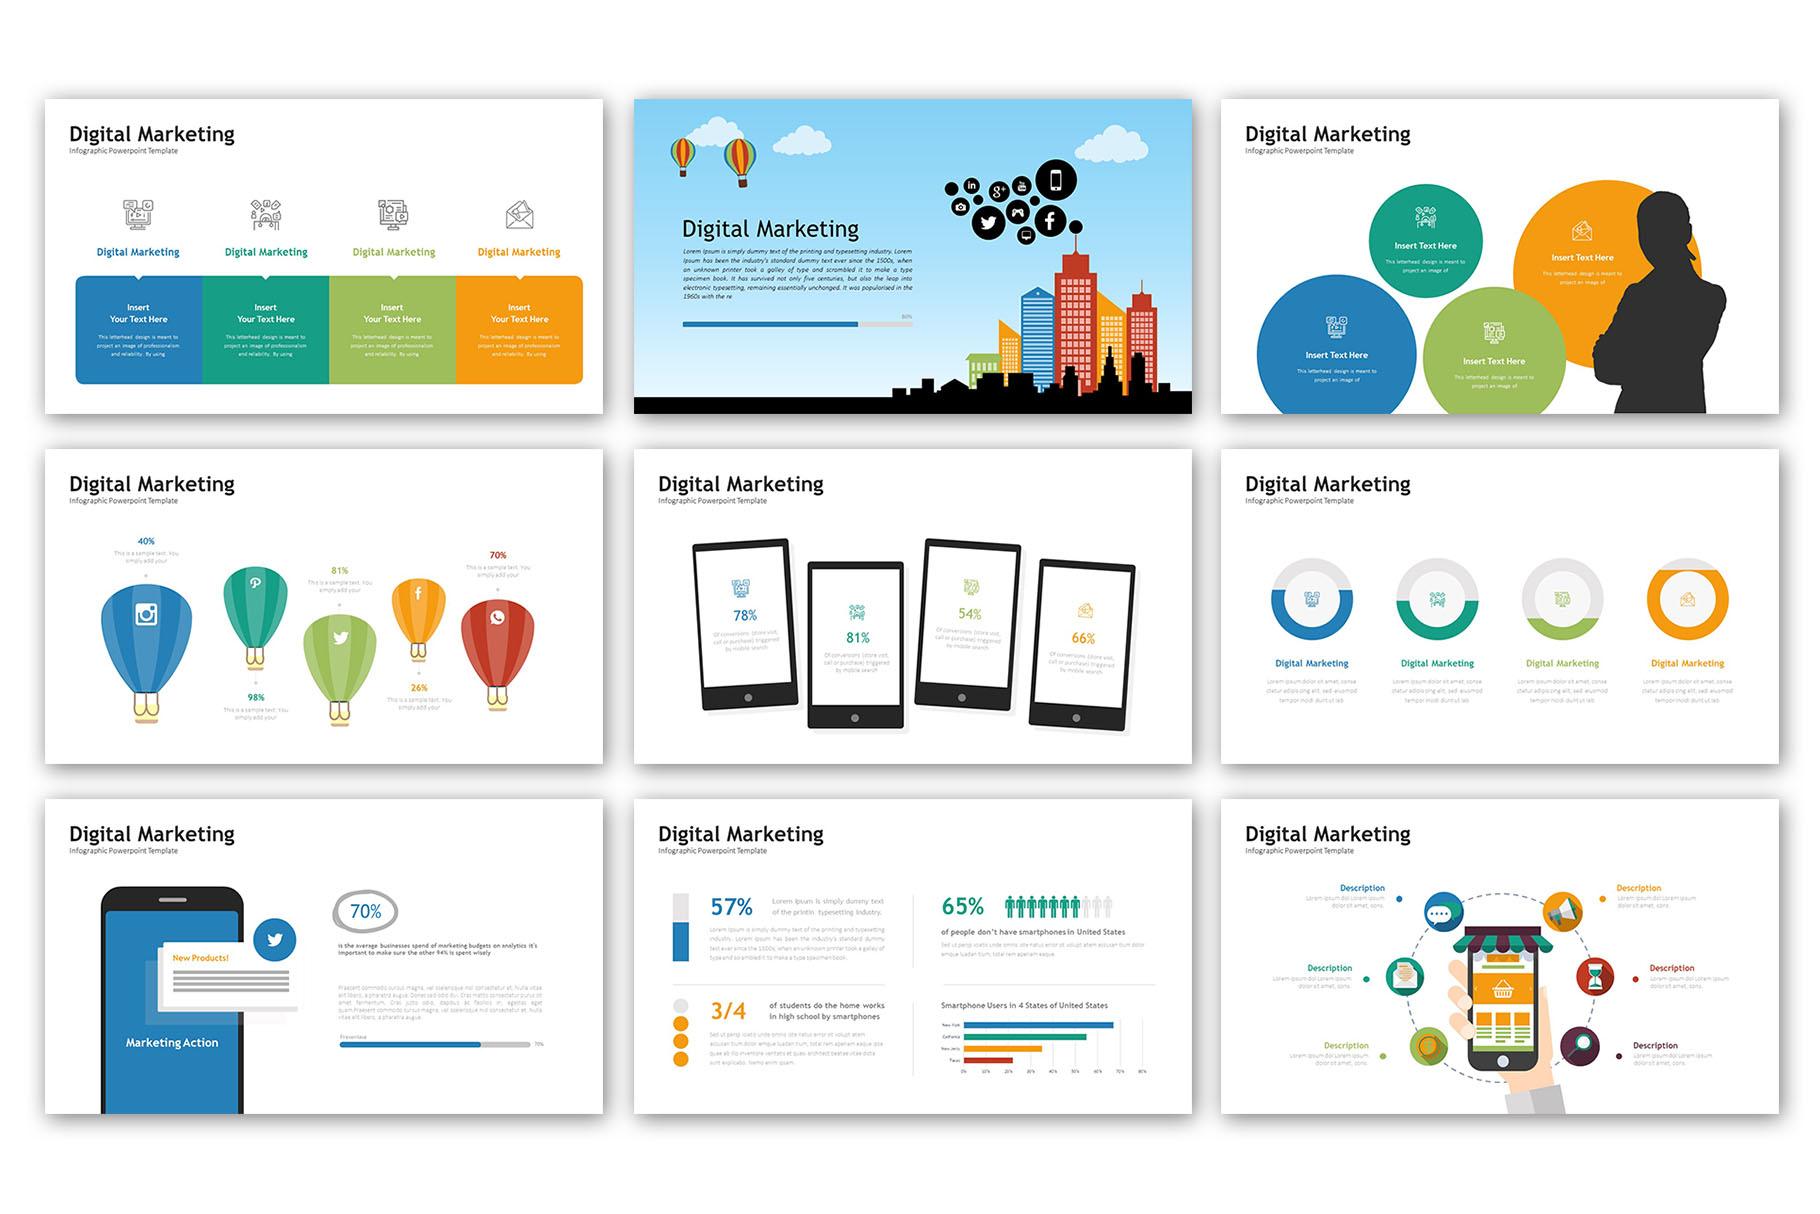 Digital Marketing Presentation - Infographic Template example image 2